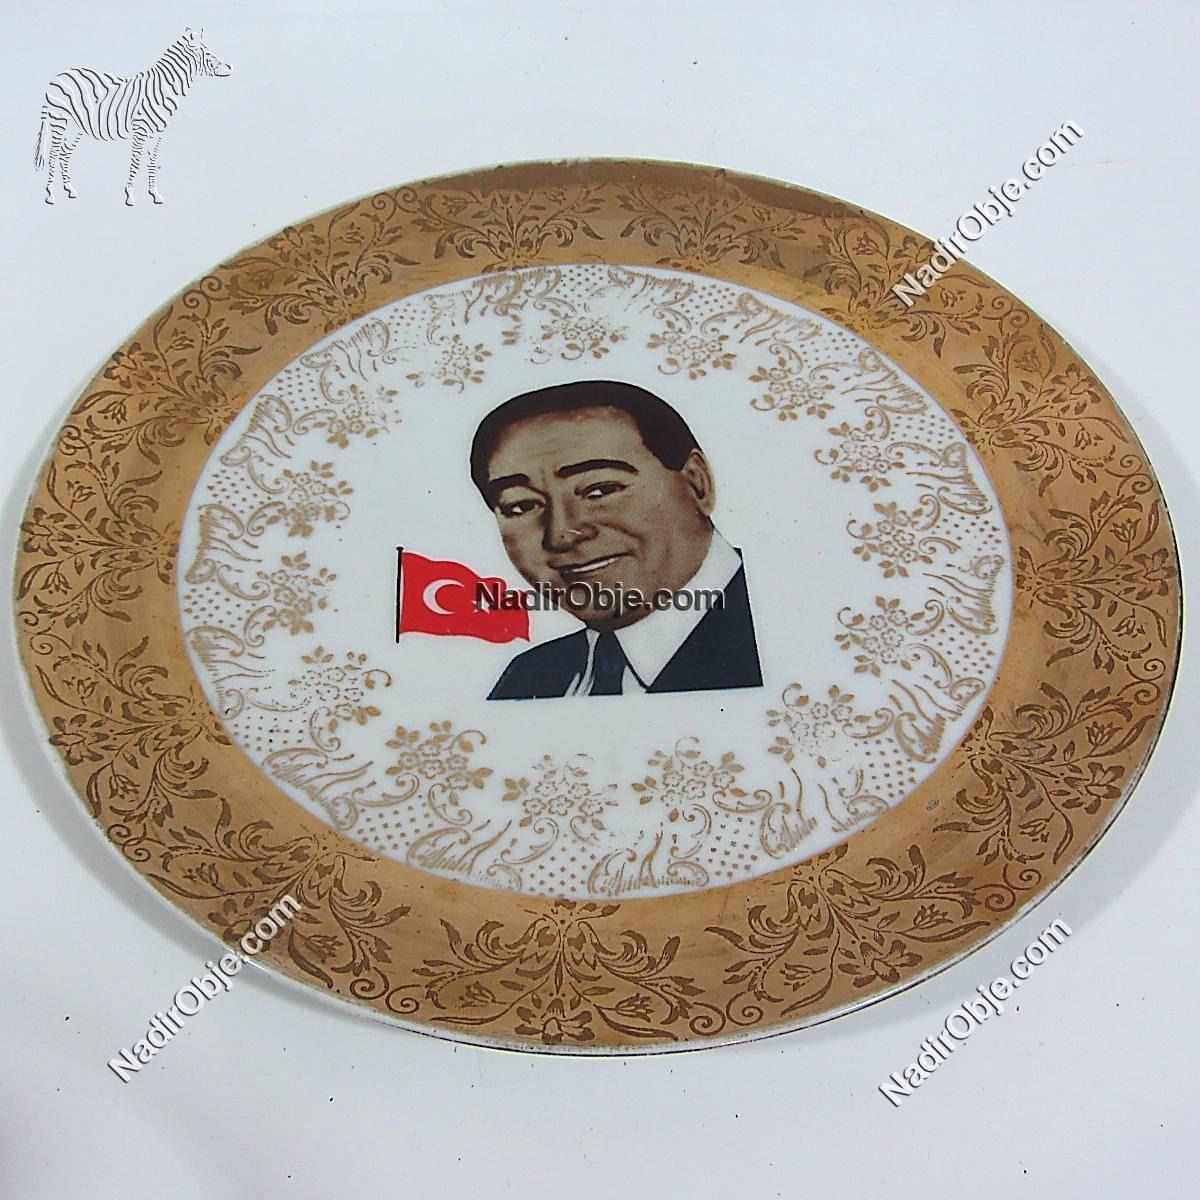 Adnan Menderes Tabak Seramik-Porselen Objeler Adnan Menderes